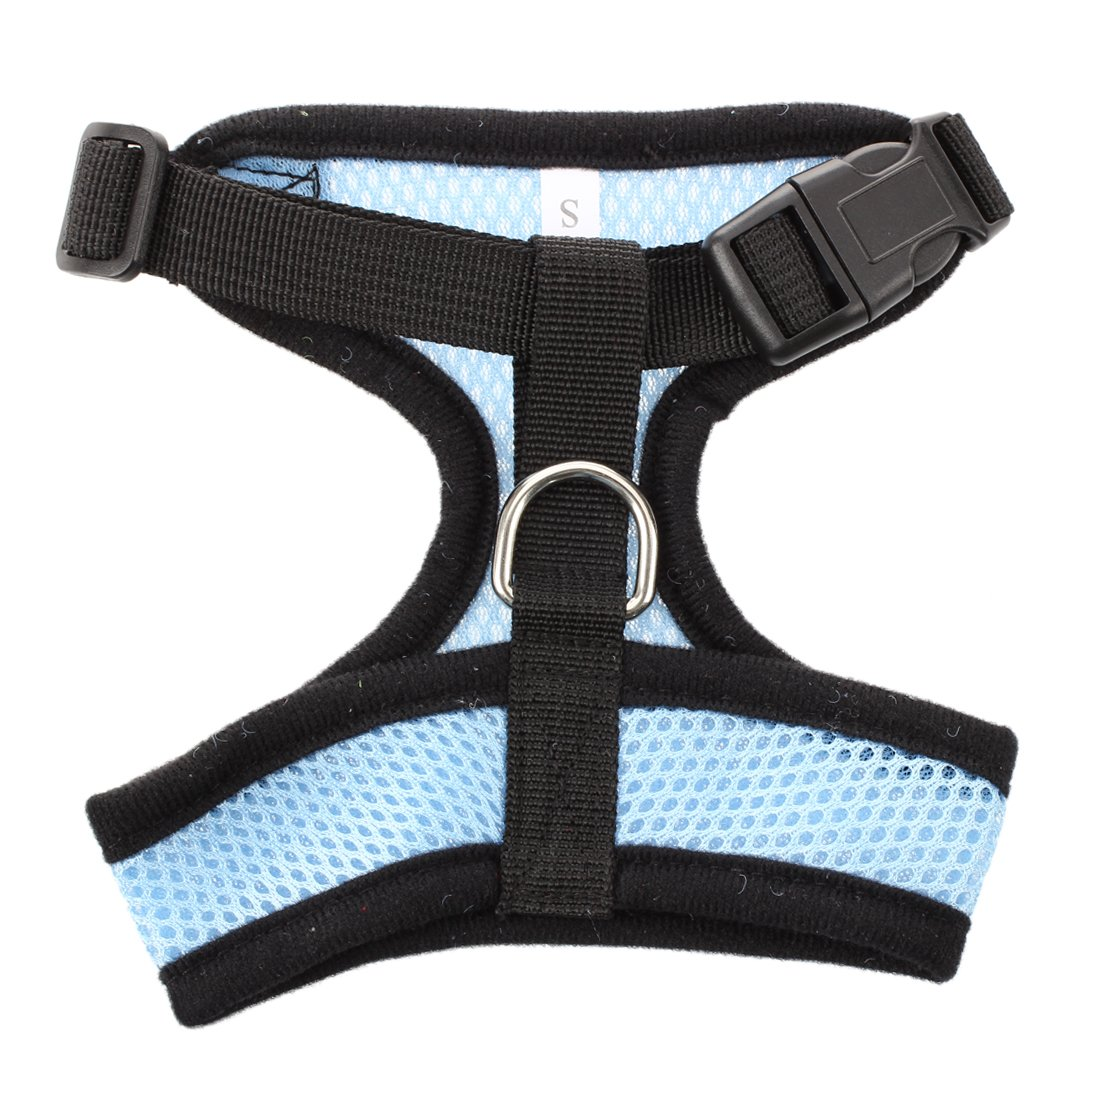 Arnes de correa de Chaleco azul claro para gatos perros mascotas S R SODIAL